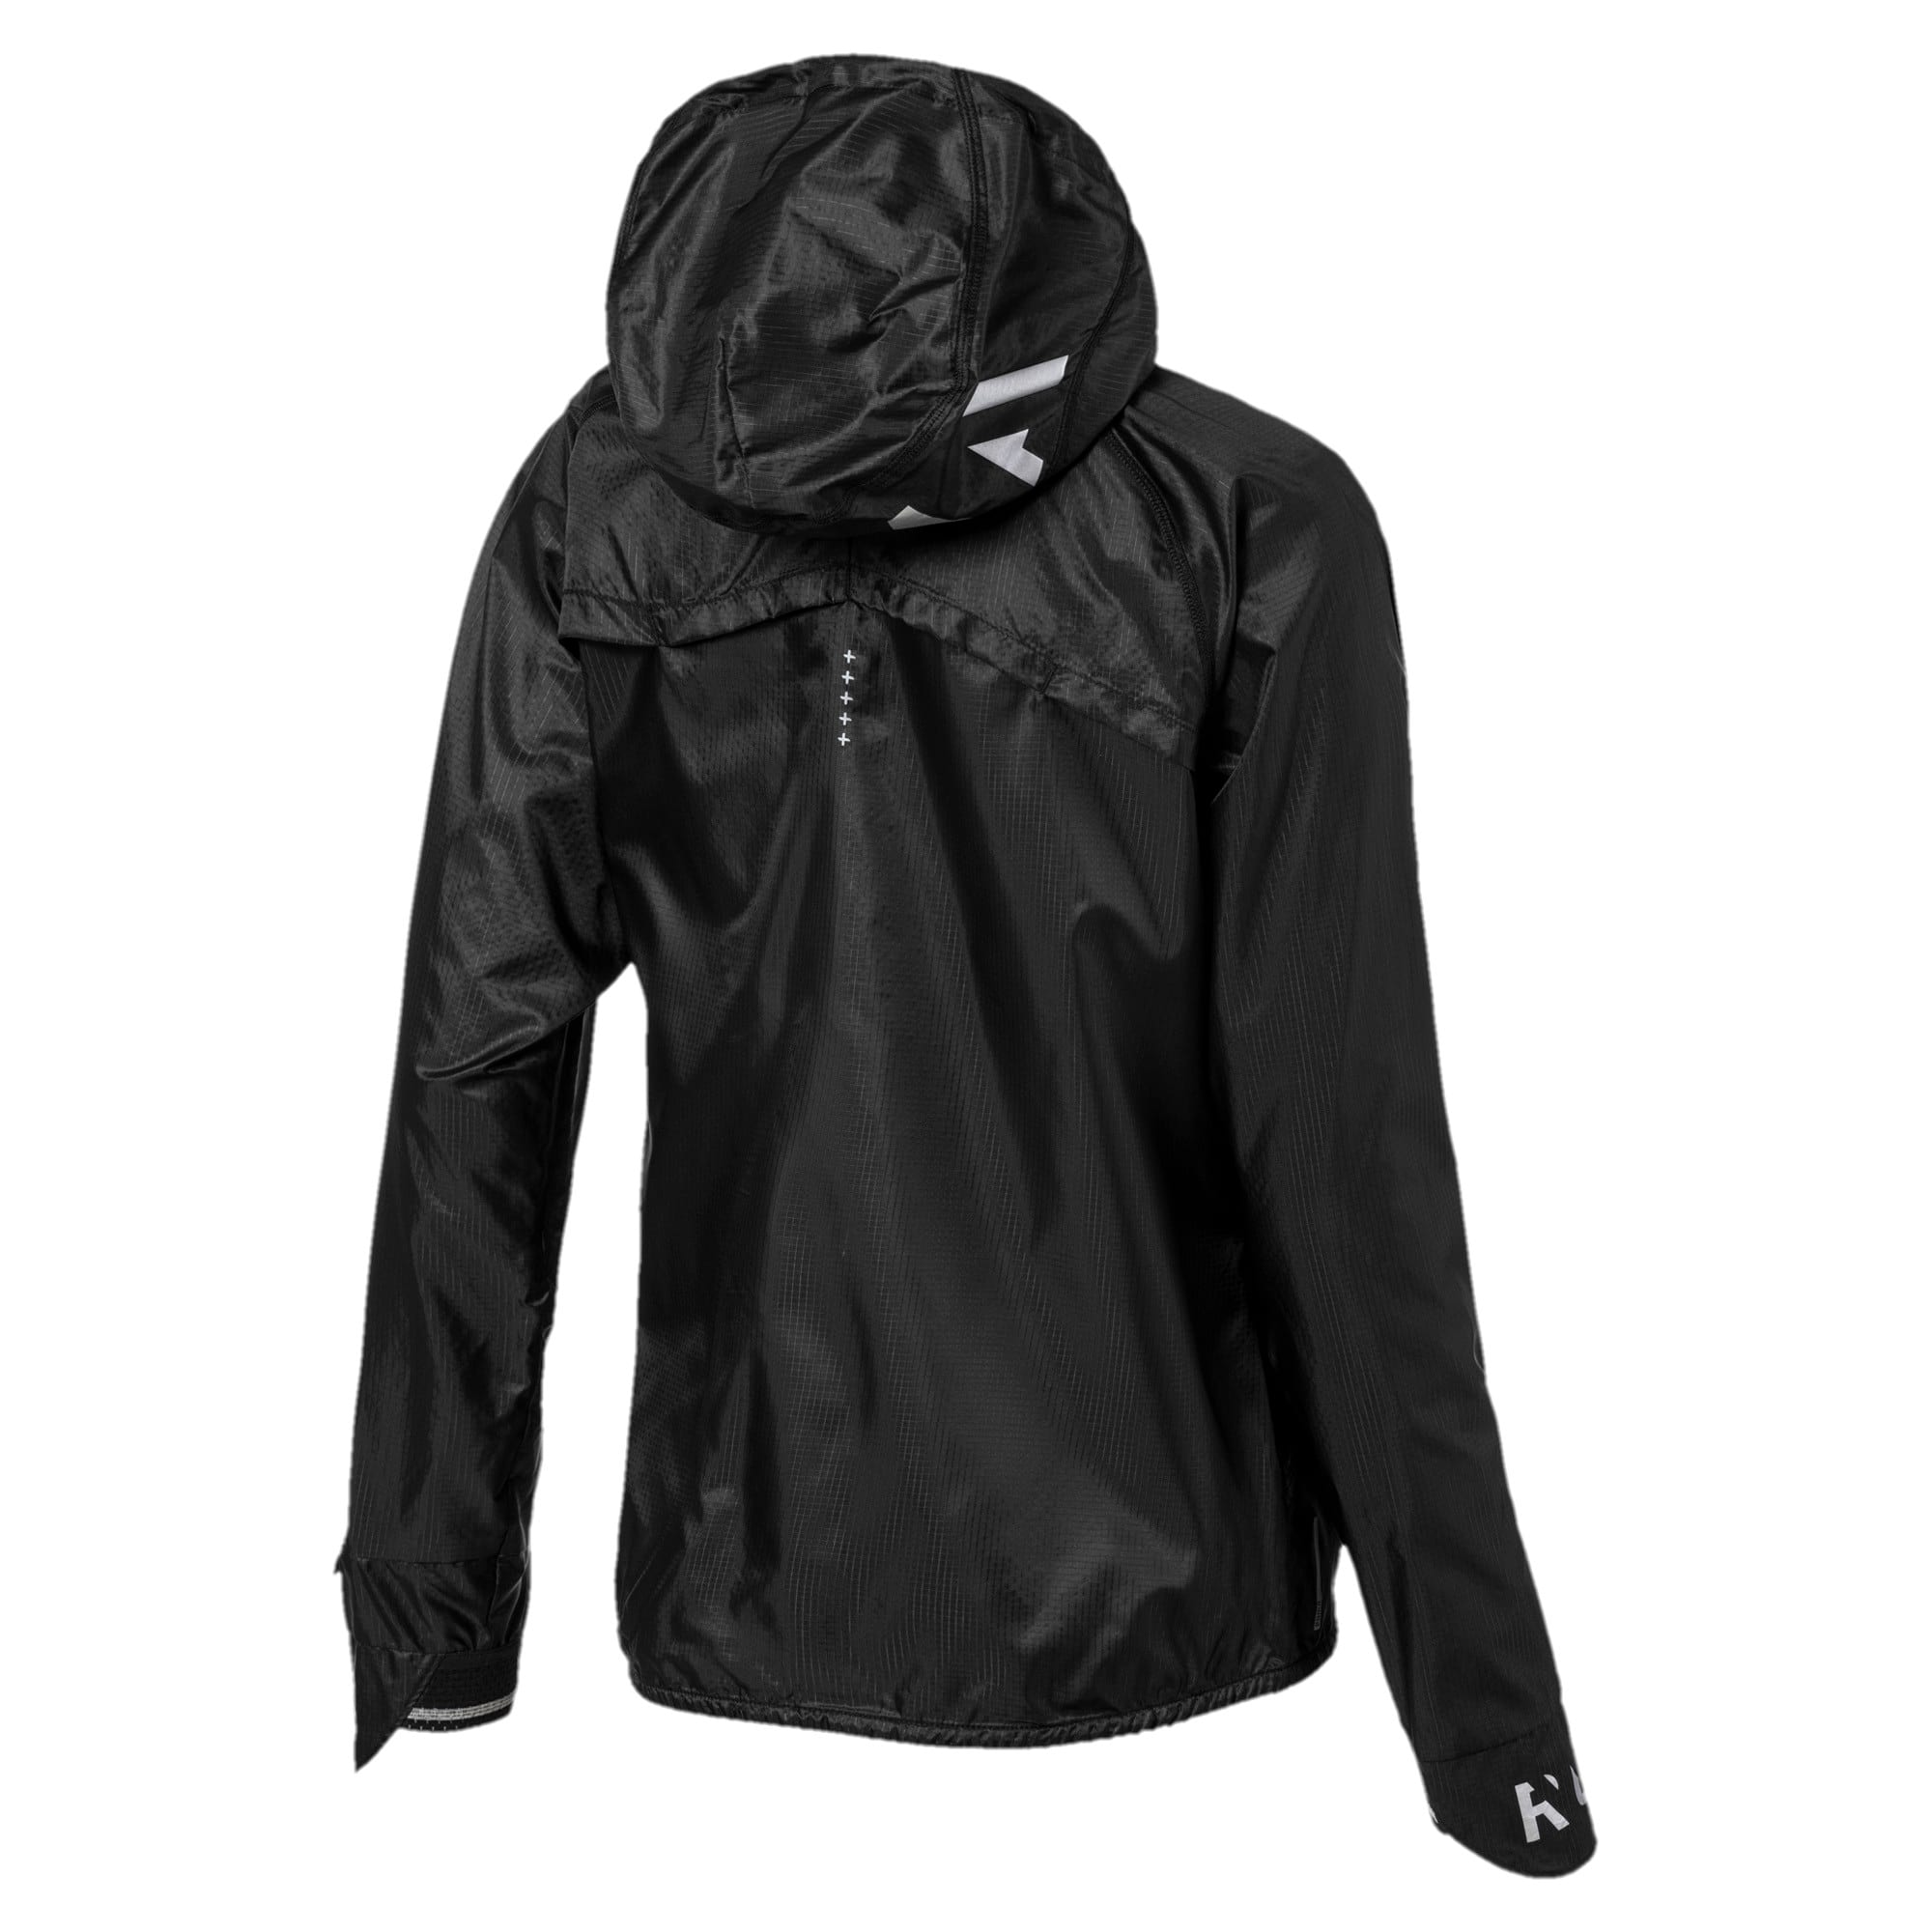 Thumbnail 5 of Get Fast Hooded Full Zip Women's Running Jacket, Puma Black, medium